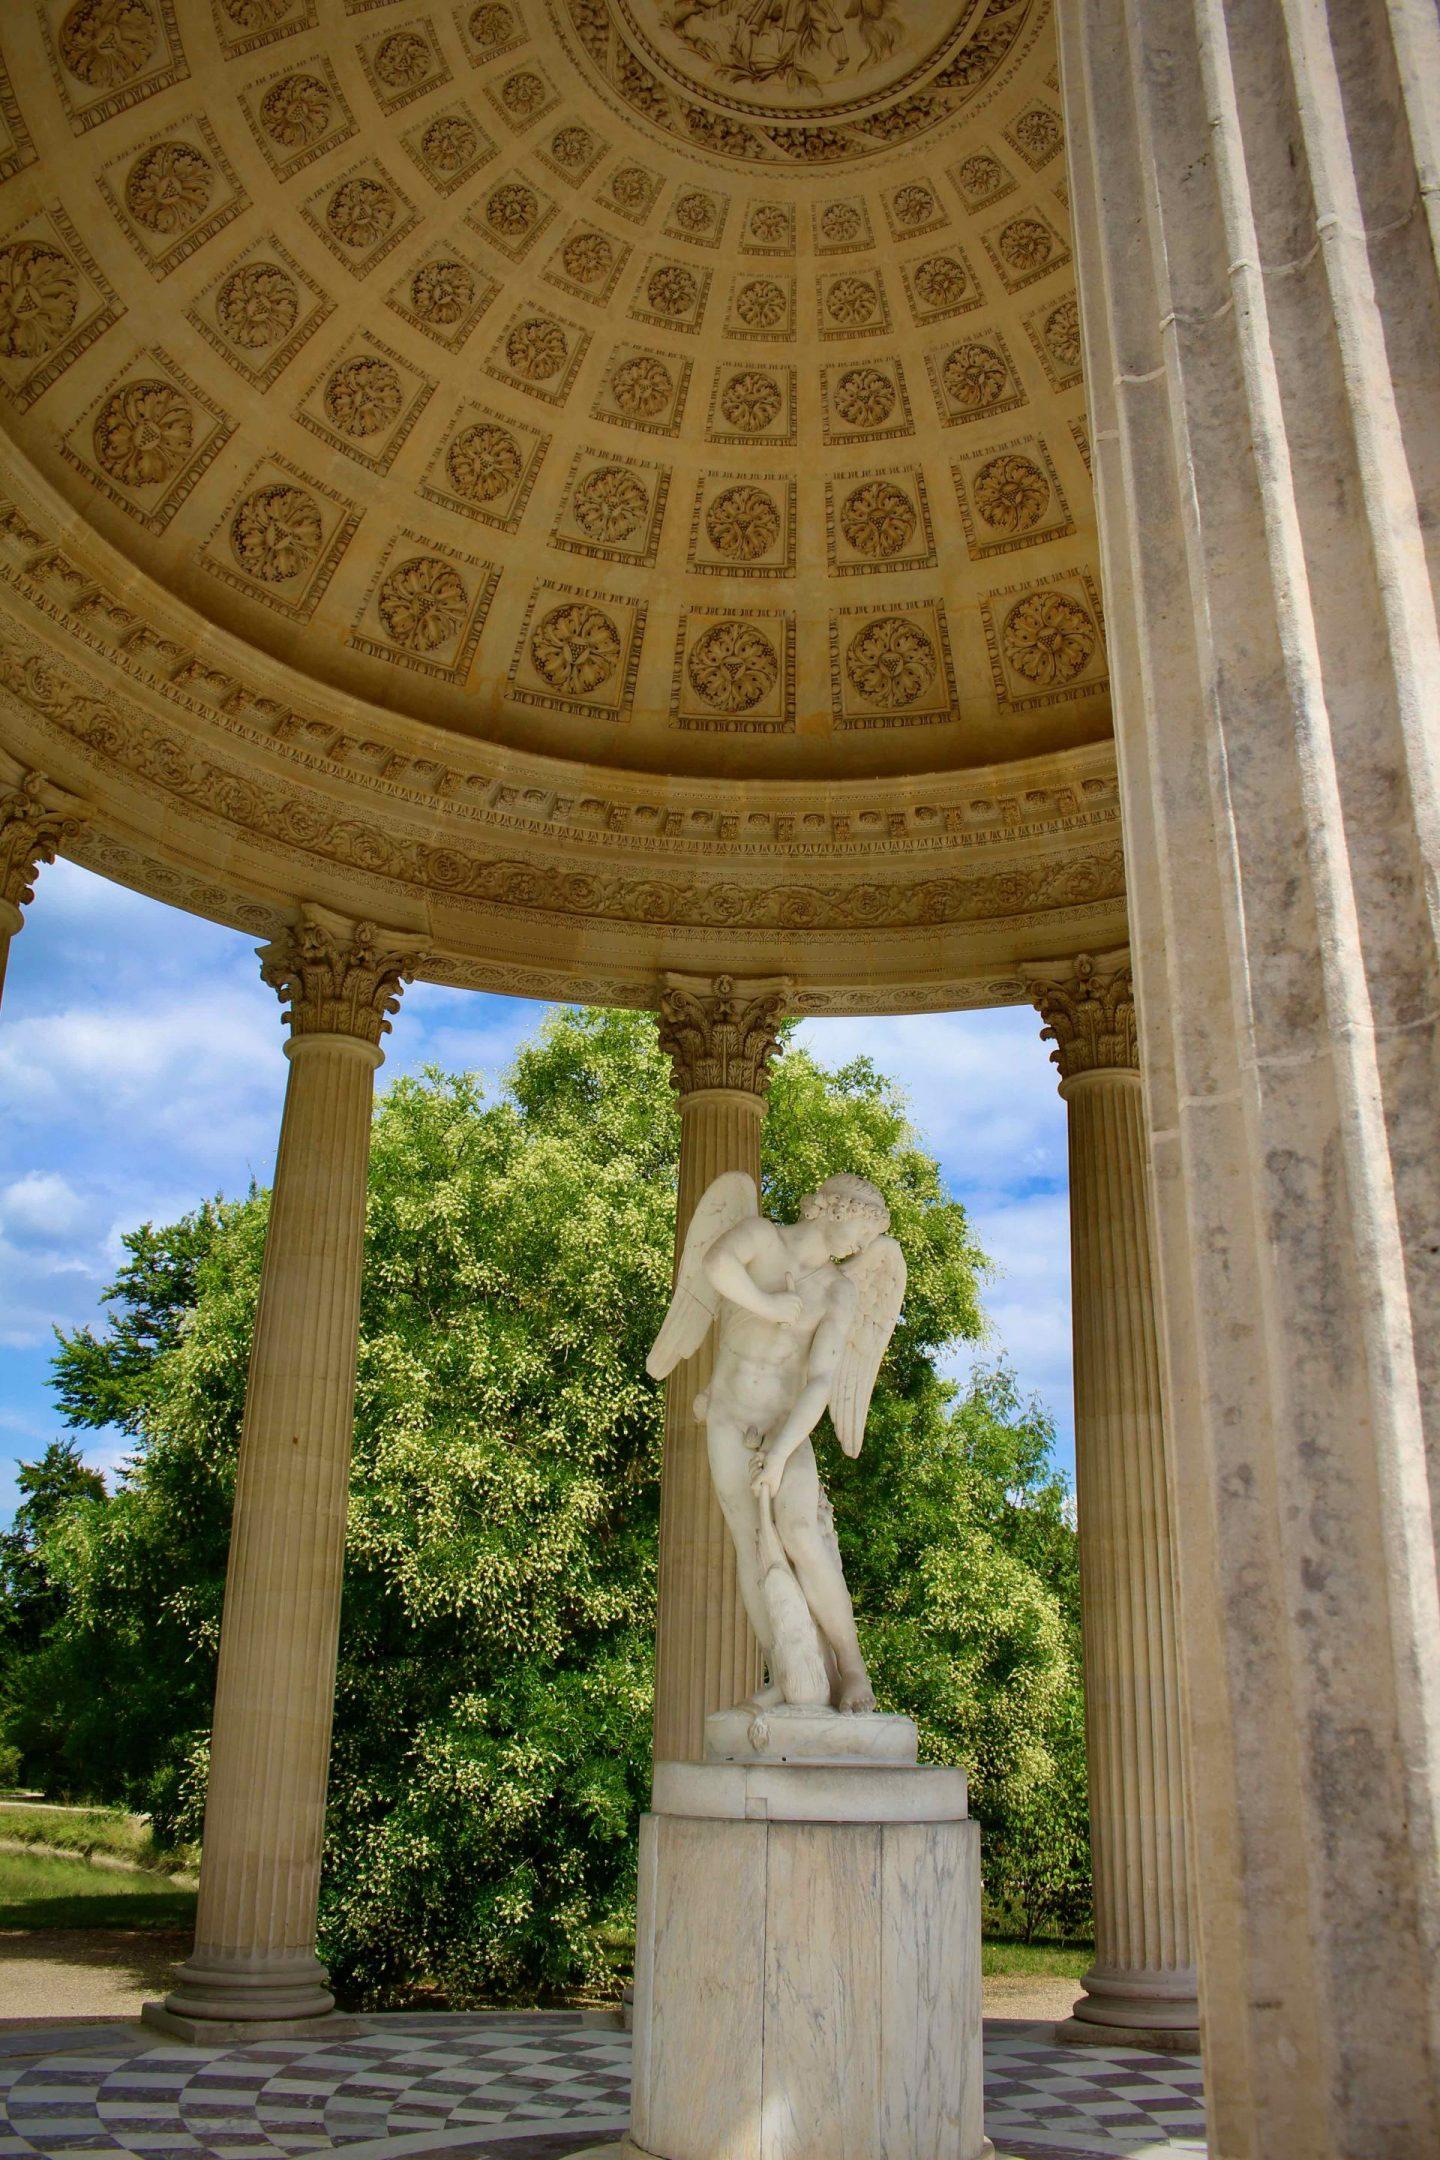 Versailles Gardens | Day trip from Paris to Versailles | The Spectacular Adventurer